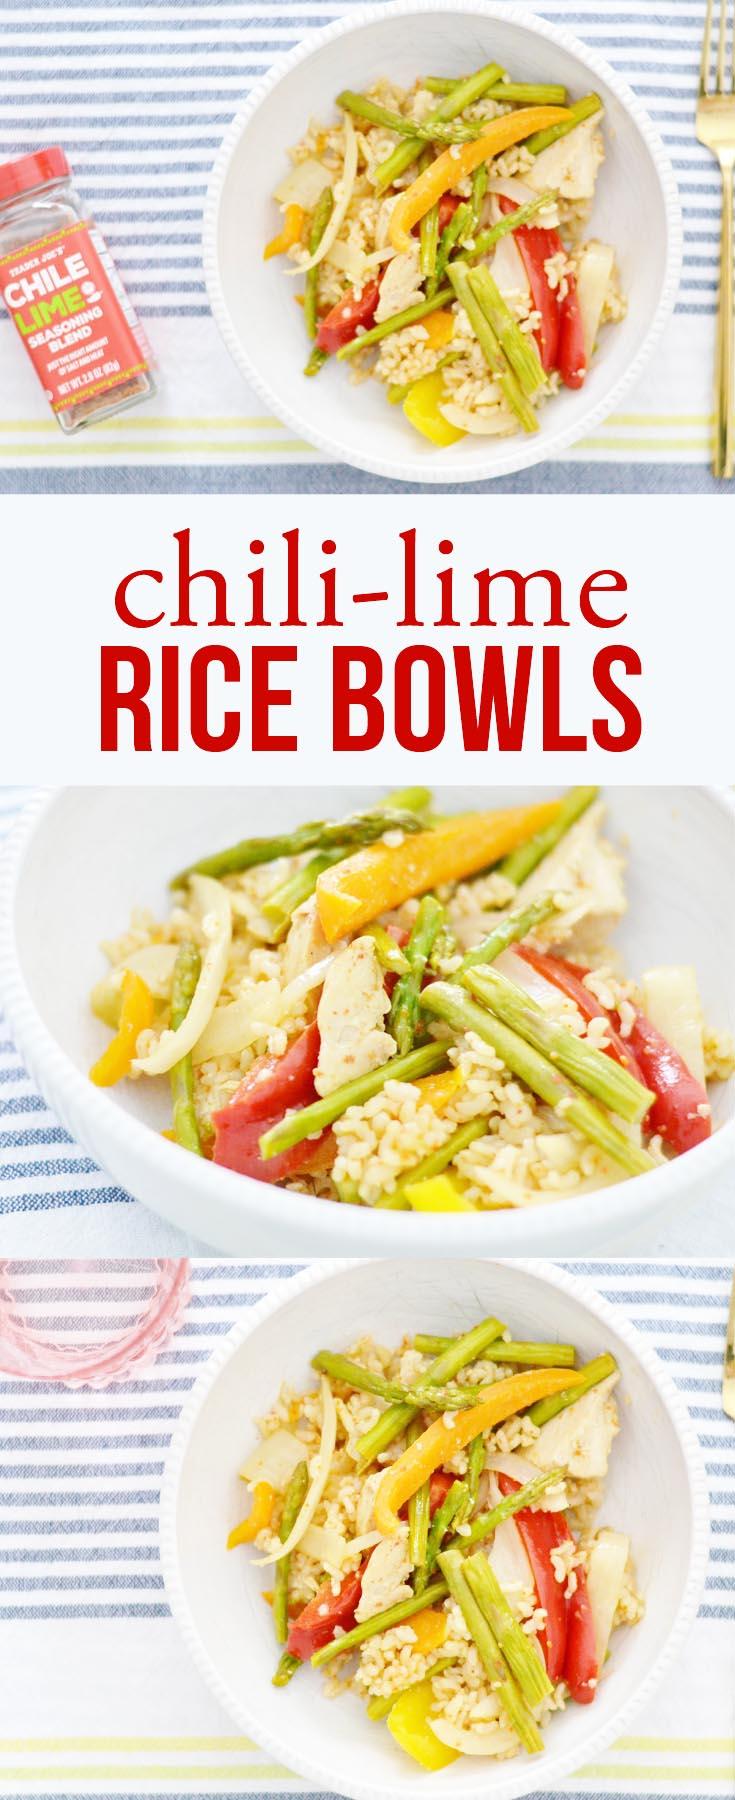 chili lime rice bowls